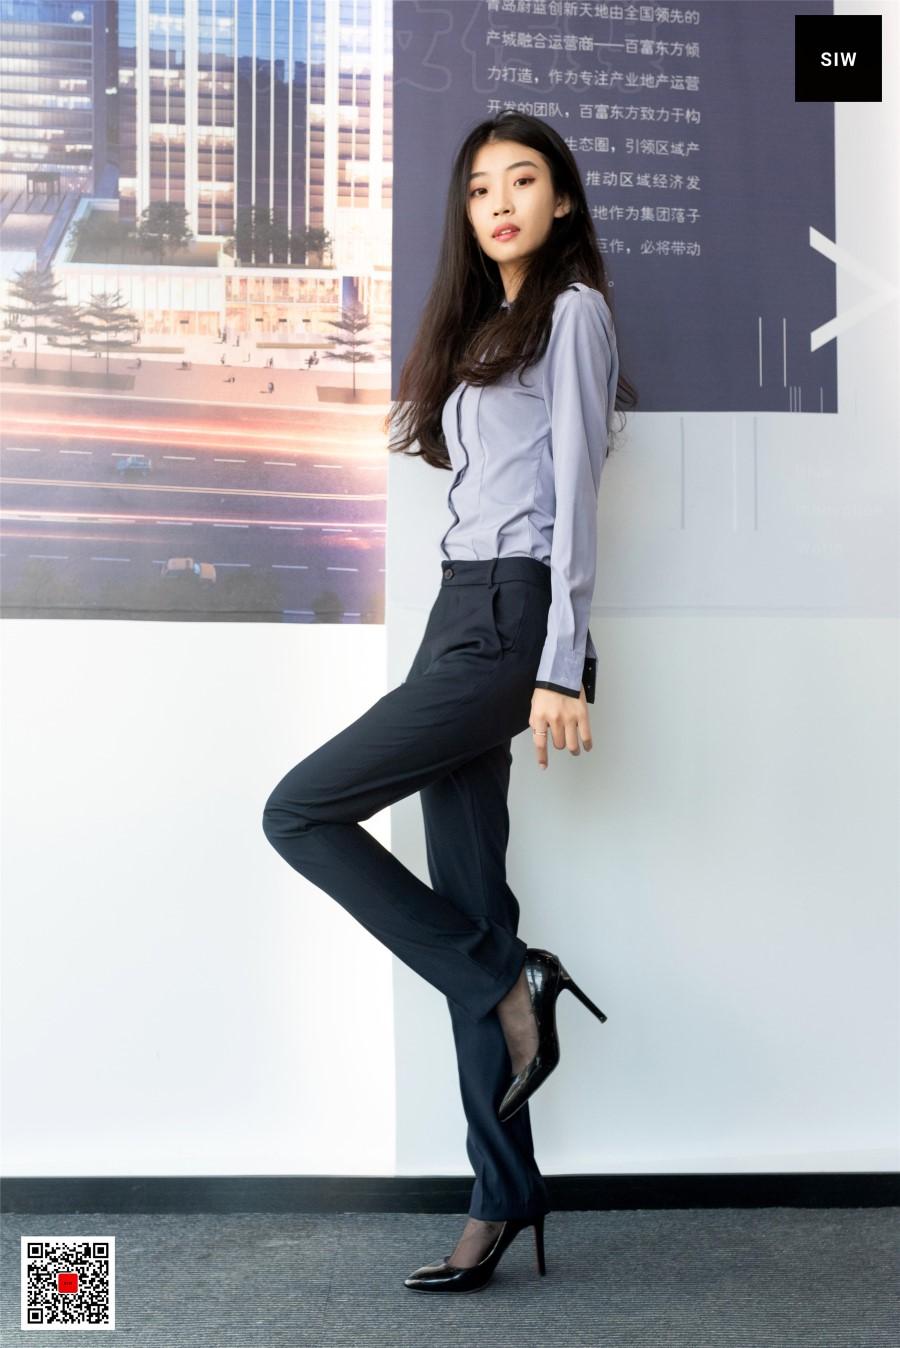 [SIW斯文传媒]VOL.083 蓉儿 女总裁职业白领制服衬衣长裤工装